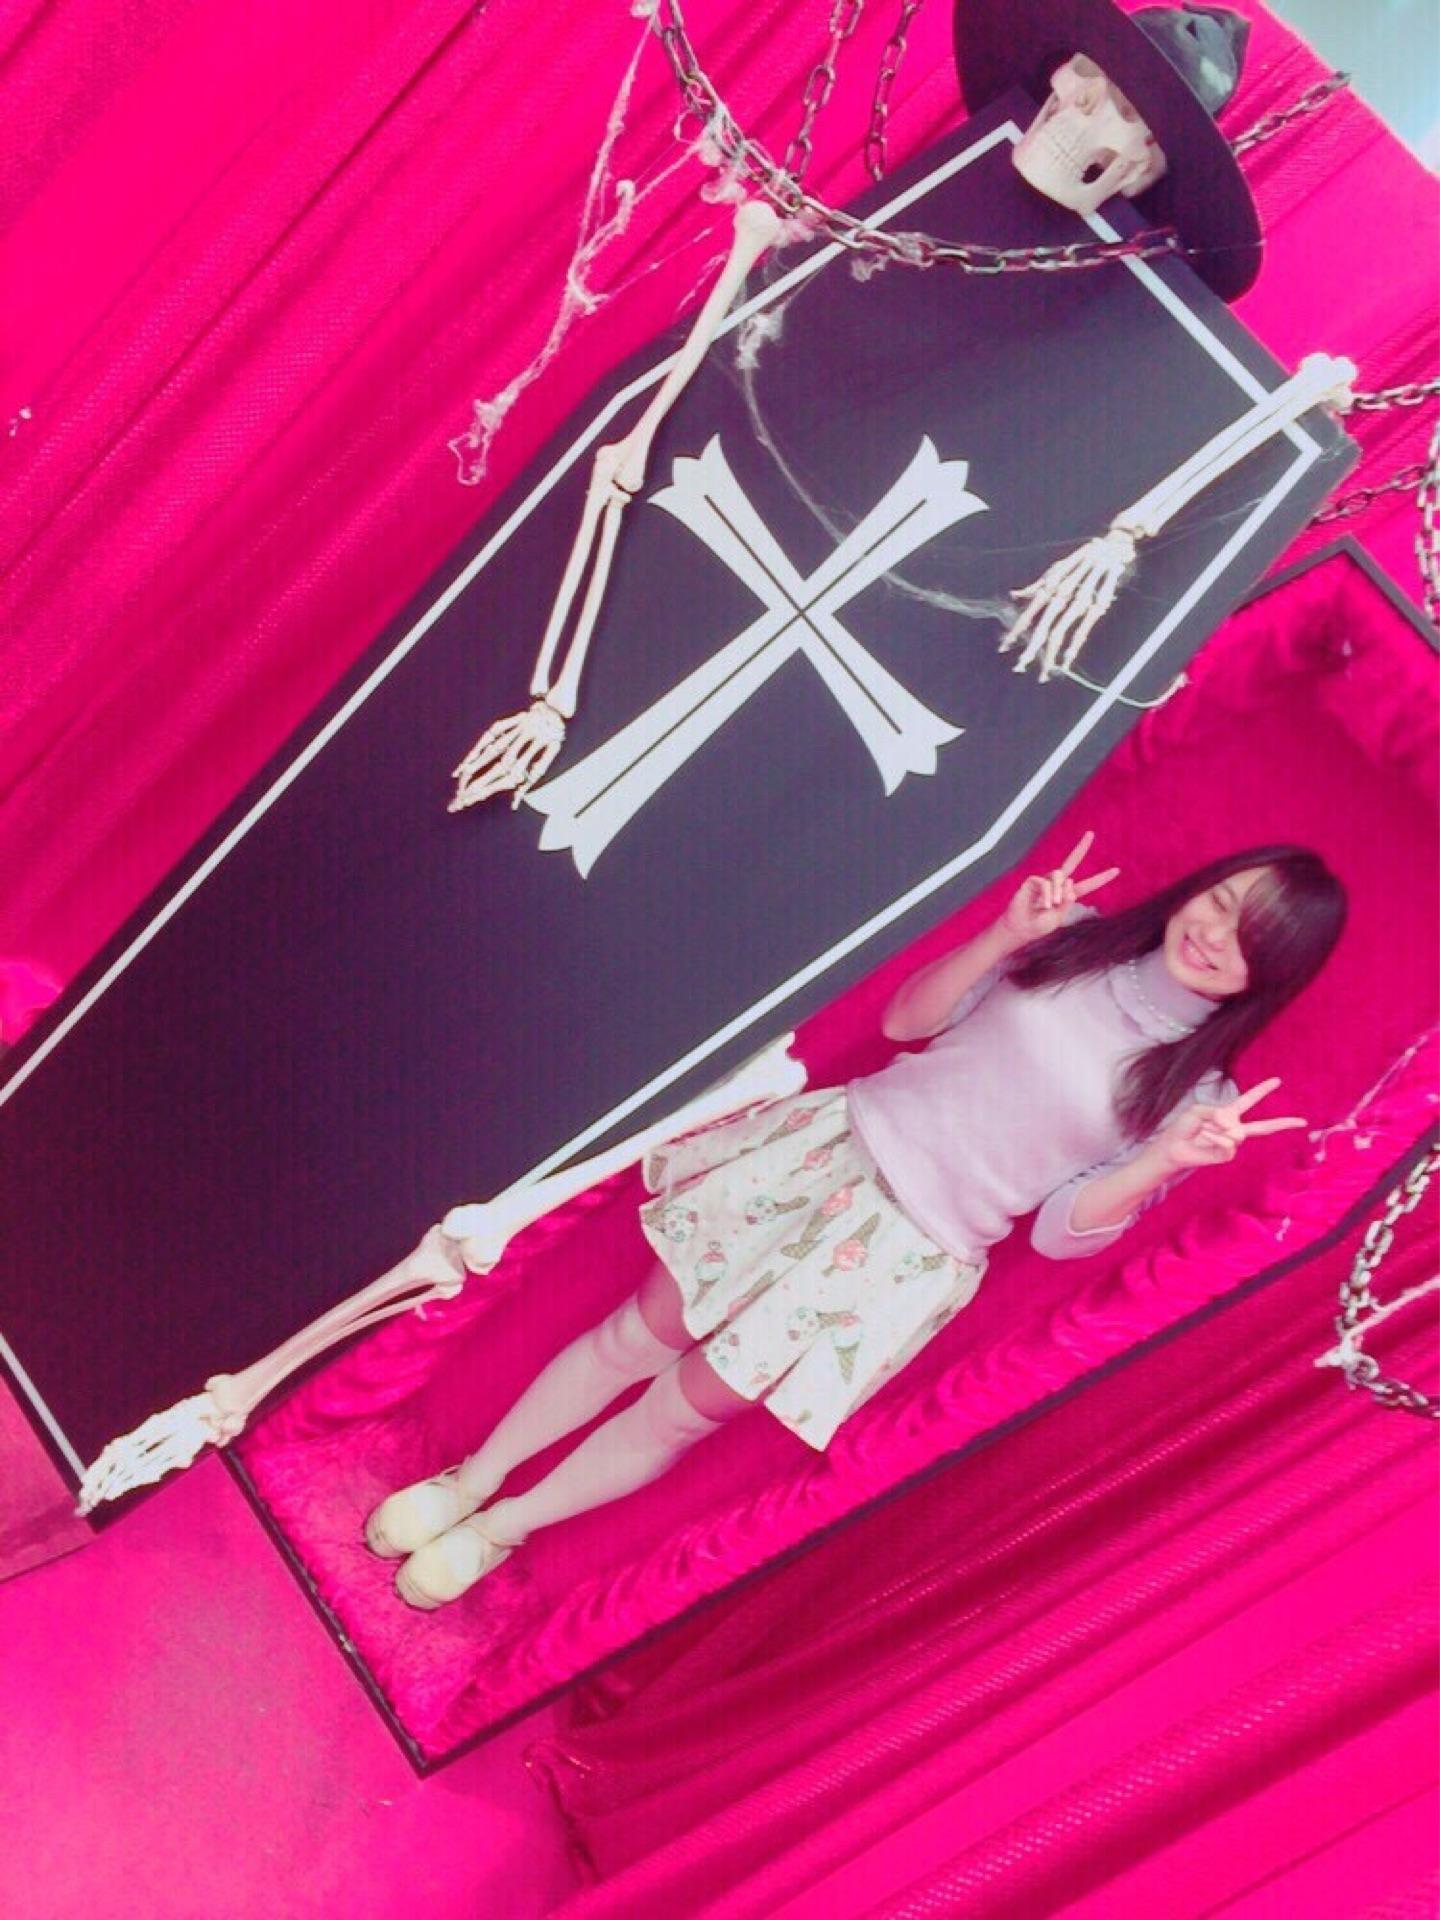 【HKT48】豊永阿紀応援スレ★2【あき/4期研究生】©2ch.netYouTube動画>16本 ->画像>1720枚